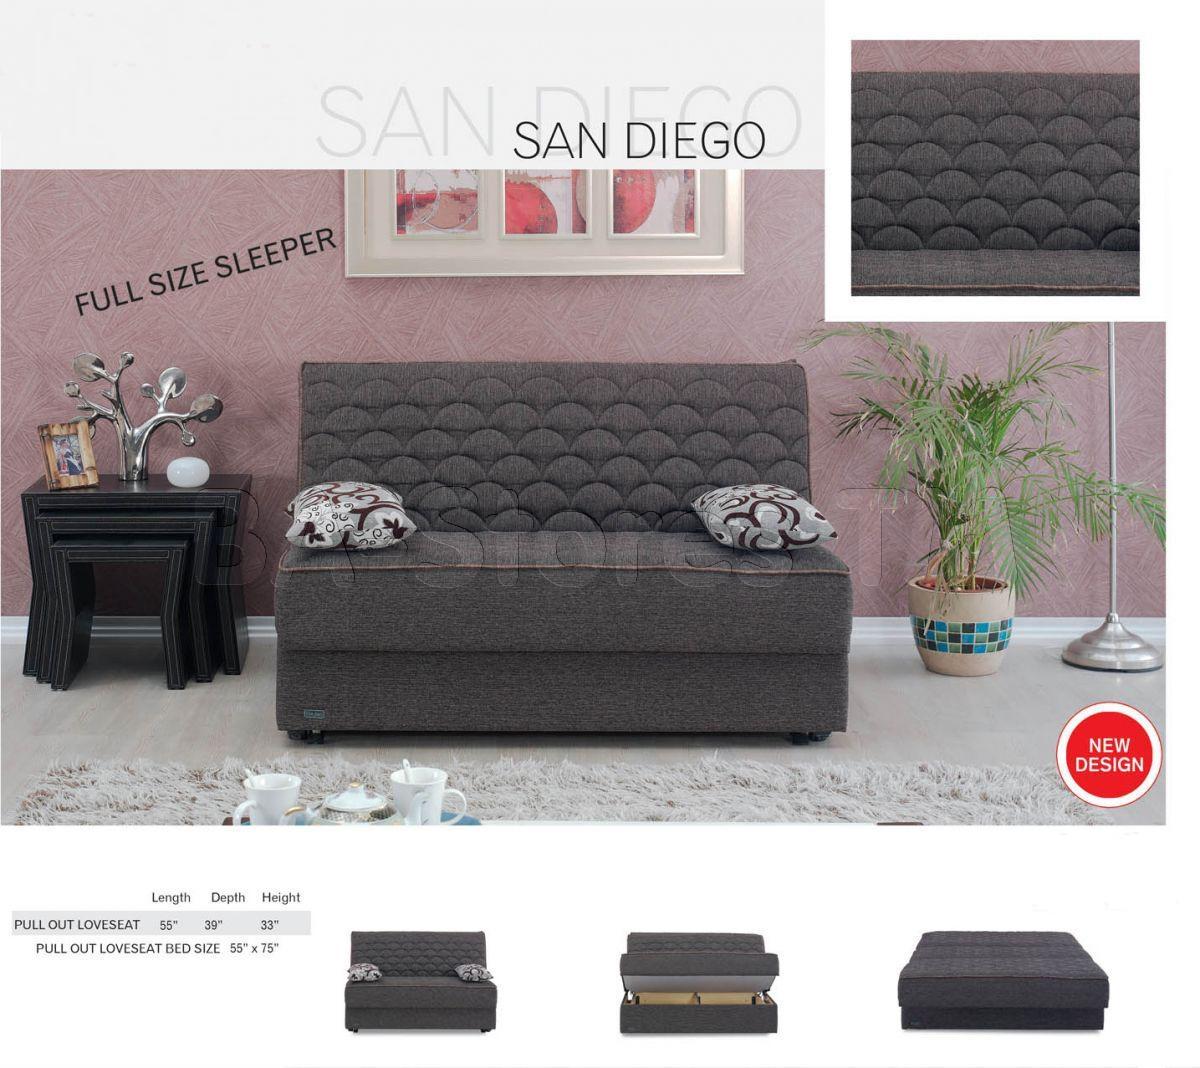 Sofa Beds: San Diego Armless Sleeper Sofa Bed San Diego Sofa/7 Intended For Sleeper Sofas San Diego (Image 19 of 20)